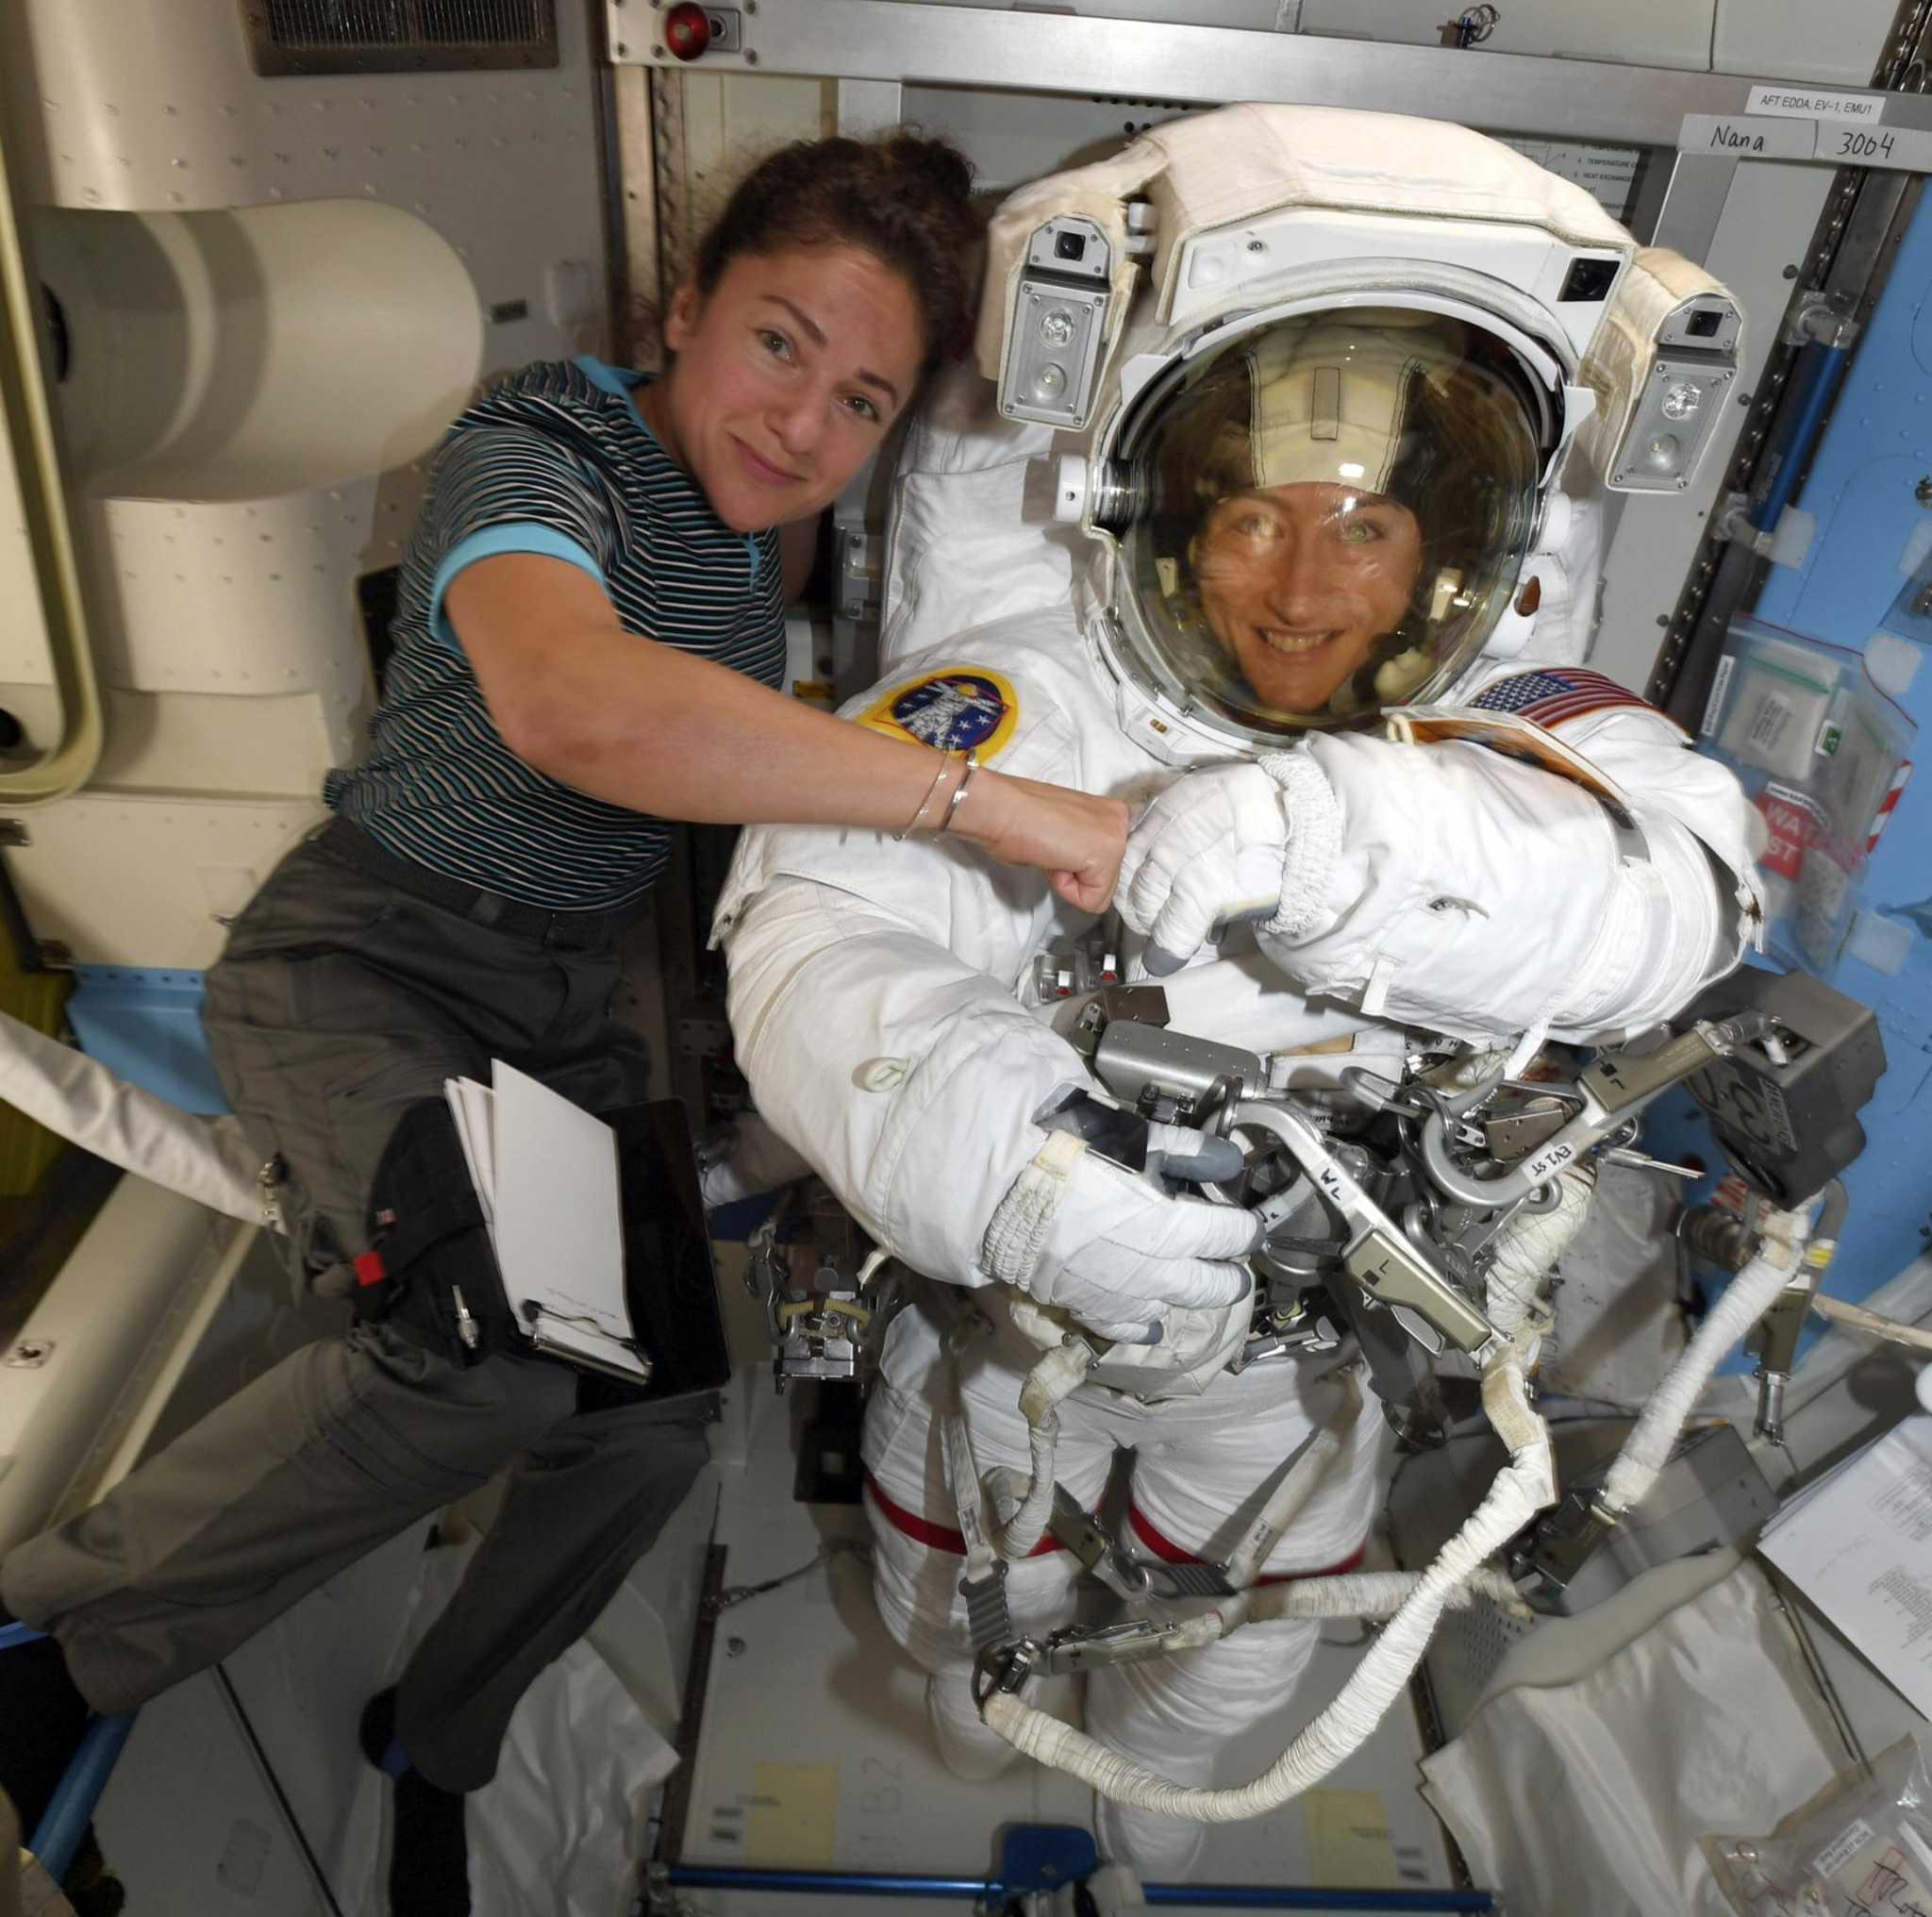 NASA to show world next generation spacesuit designs